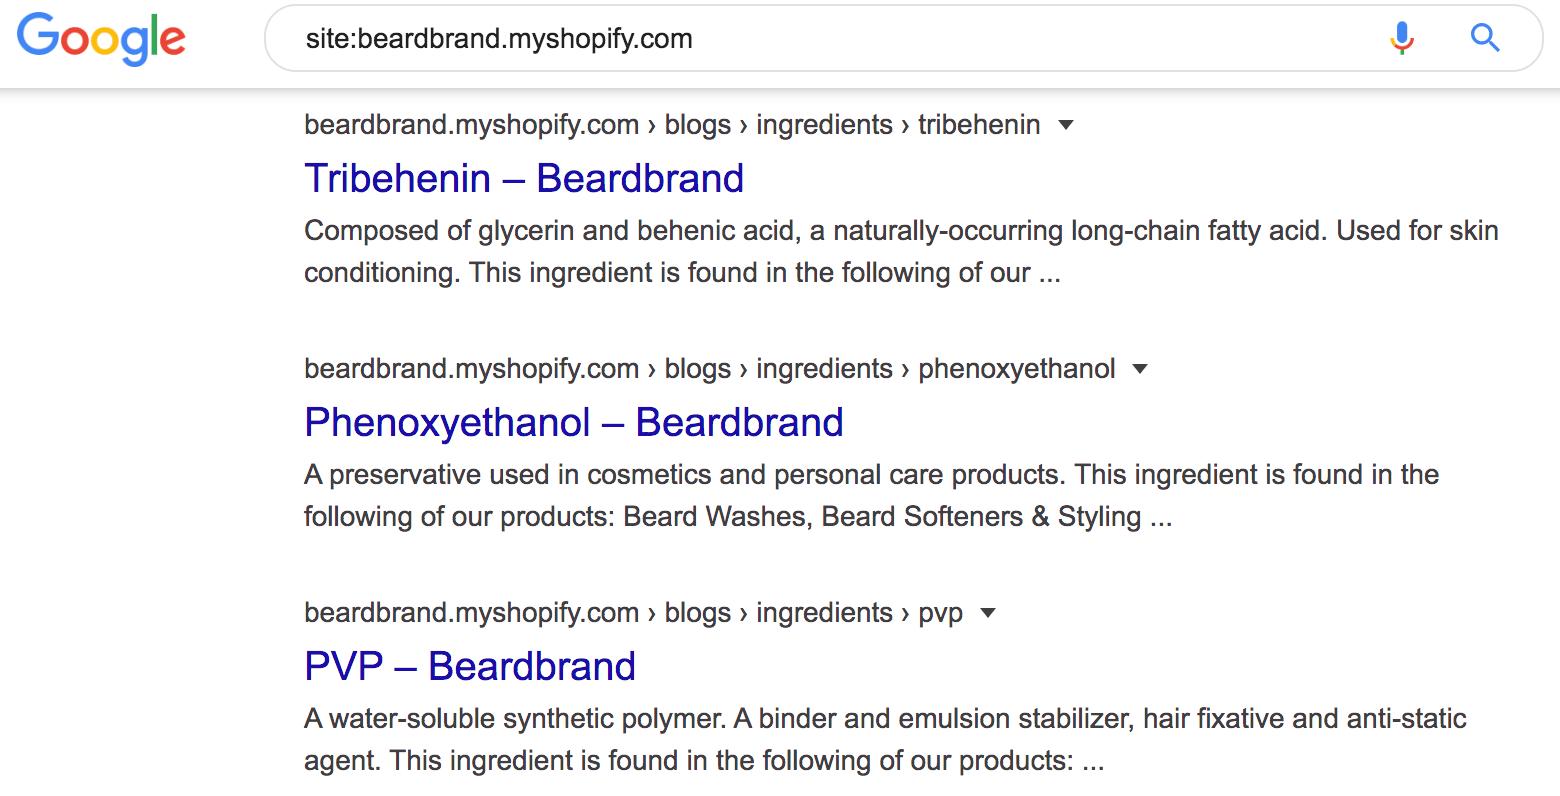 beardbrand myshopify